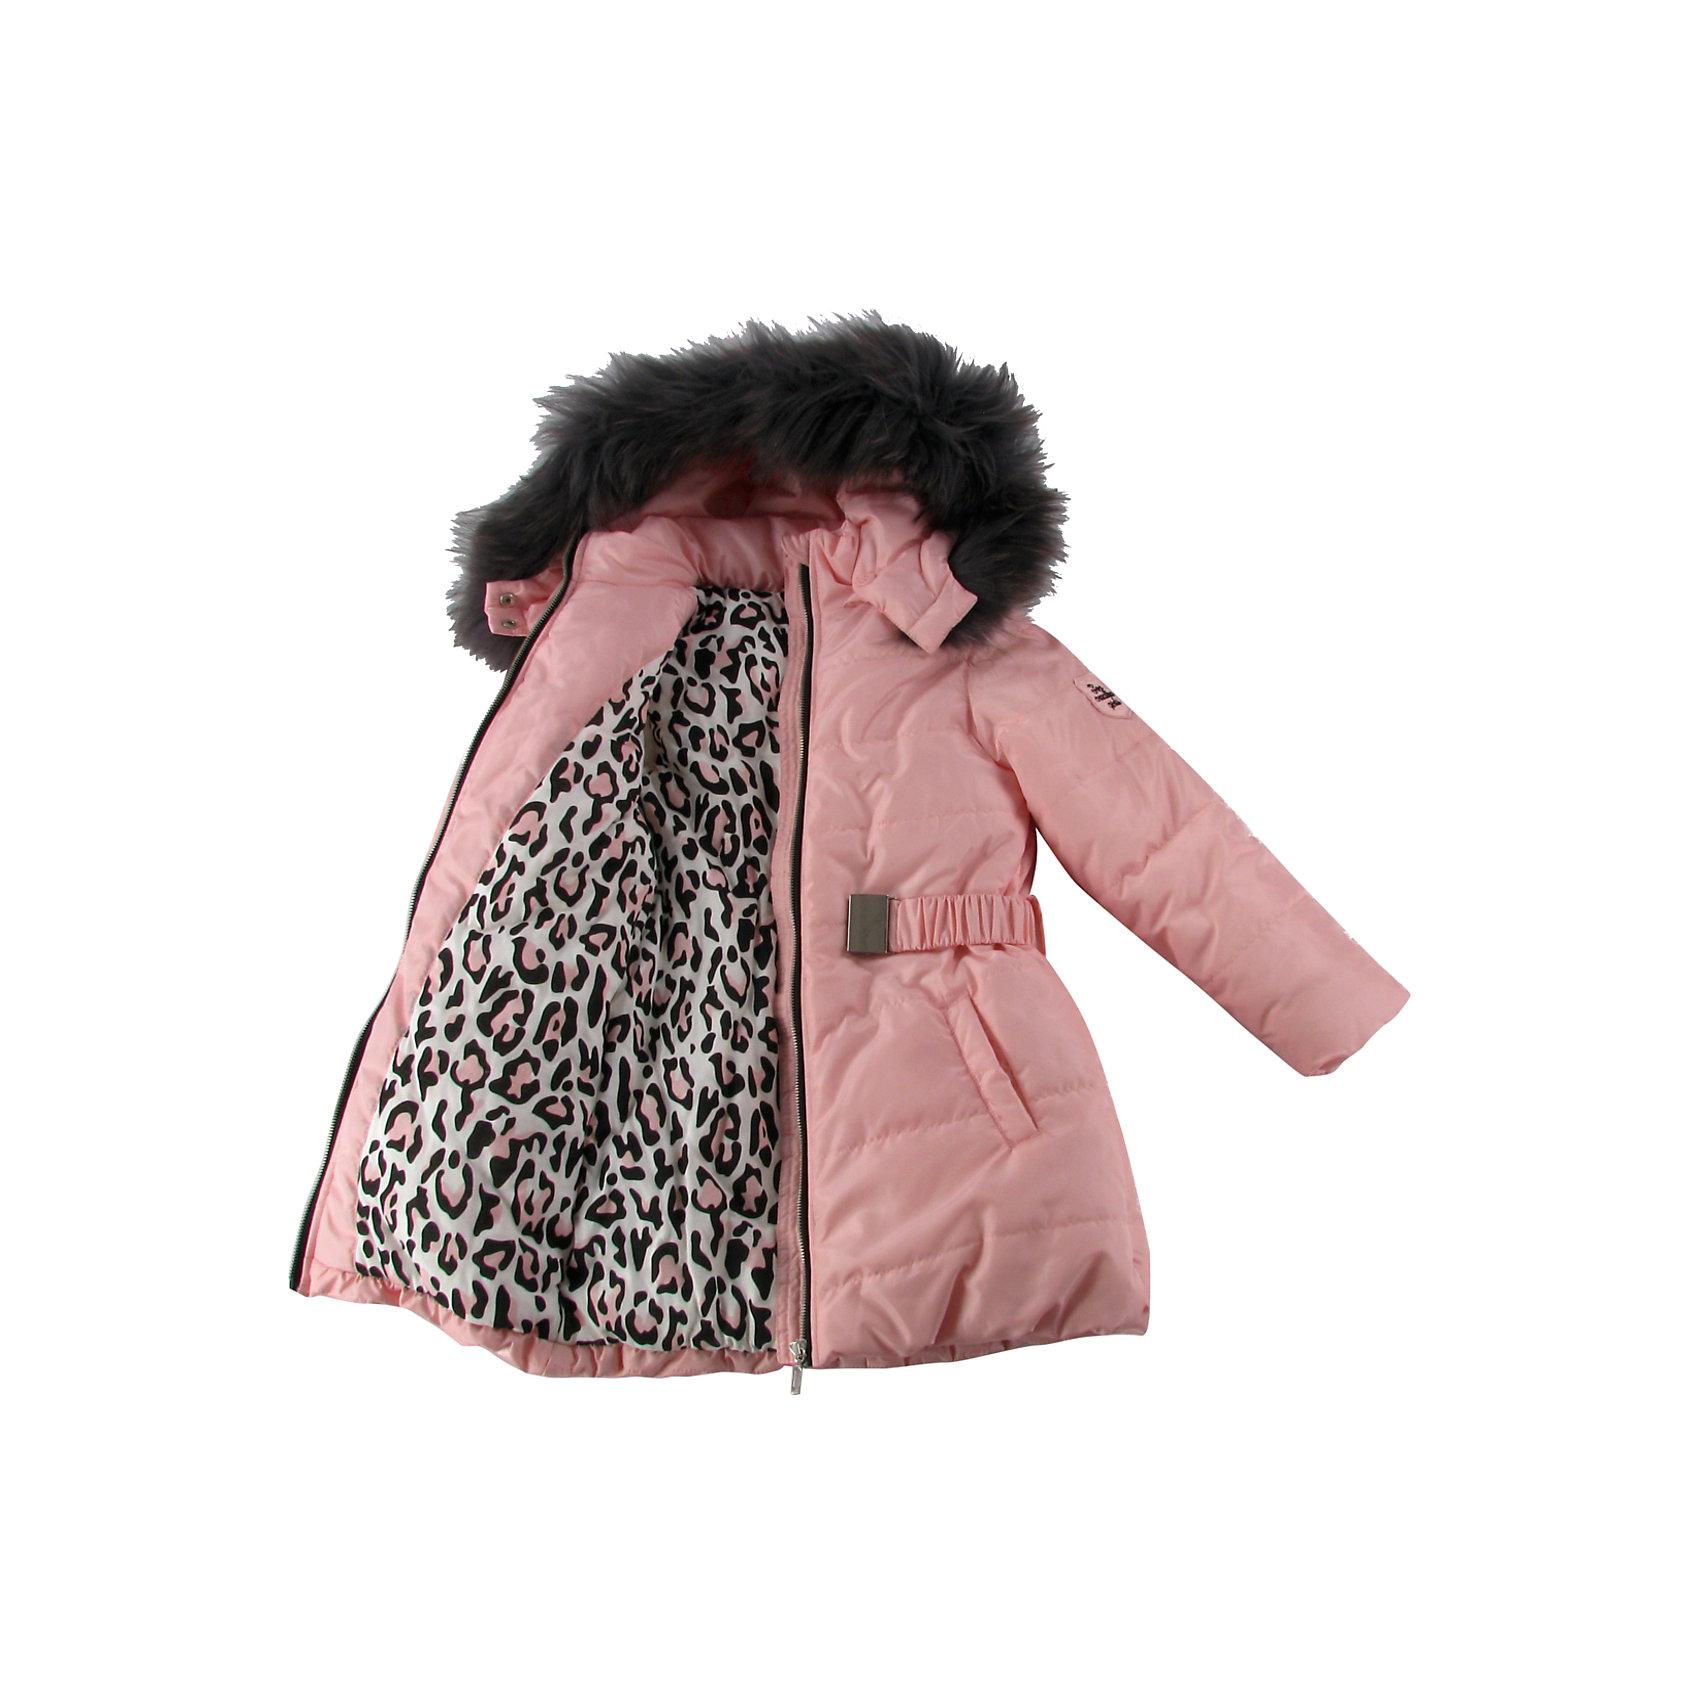 Куртка утепленная для девочки WojcikВерхняя одежда<br>Куртка утепленная для девочки Wojcik<br>Состав:<br>Полиэстер 100%<br><br>Ширина мм: 356<br>Глубина мм: 10<br>Высота мм: 245<br>Вес г: 519<br>Цвет: розовый<br>Возраст от месяцев: 24<br>Возраст до месяцев: 36<br>Пол: Женский<br>Возраст: Детский<br>Размер: 98<br>SKU: 5591446